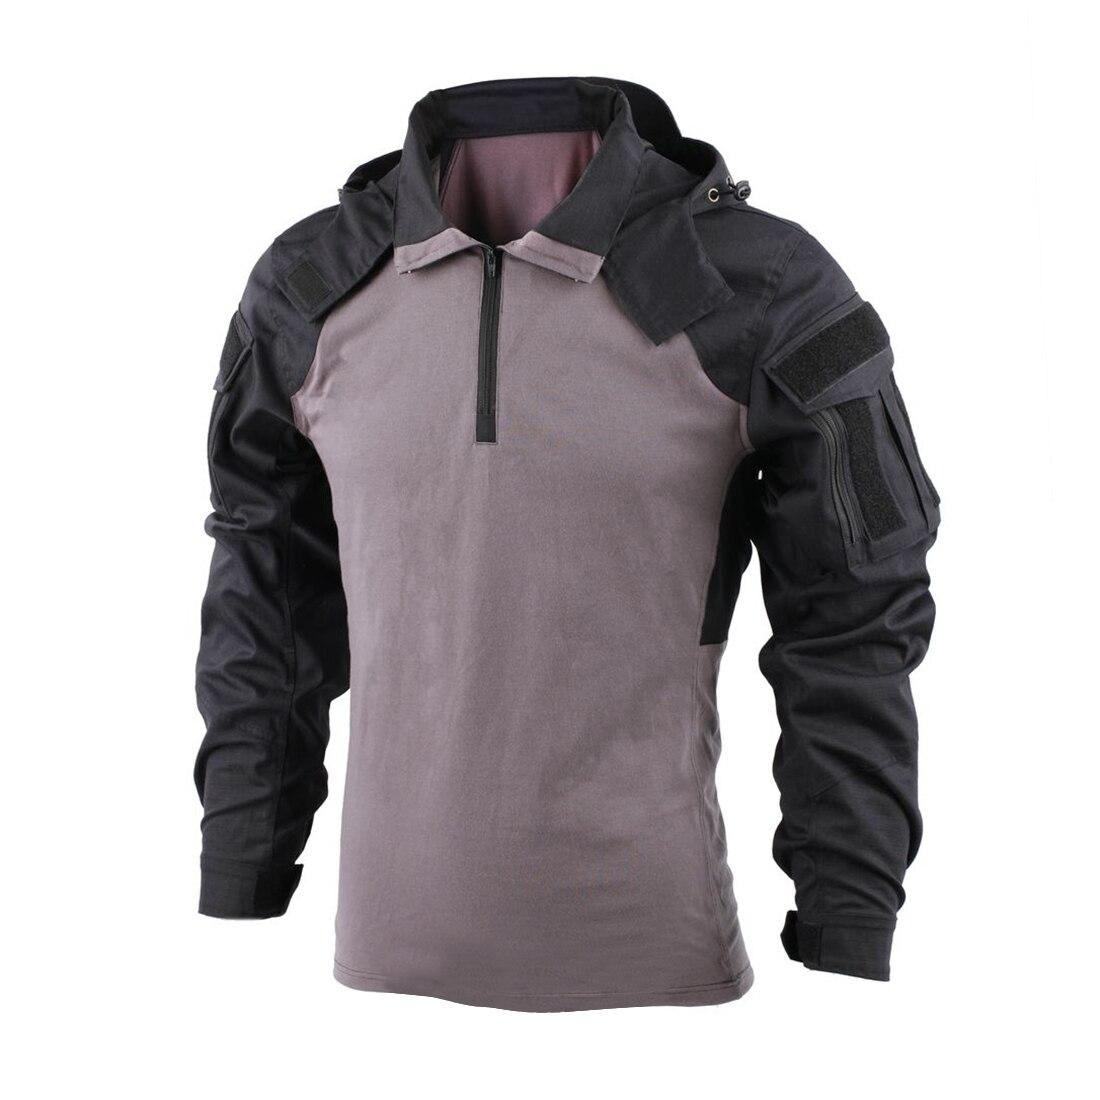 BACRAFT Tactical Shirt Combat Uniform Outdoor Equipment - SP2 Version Black Grey XXL